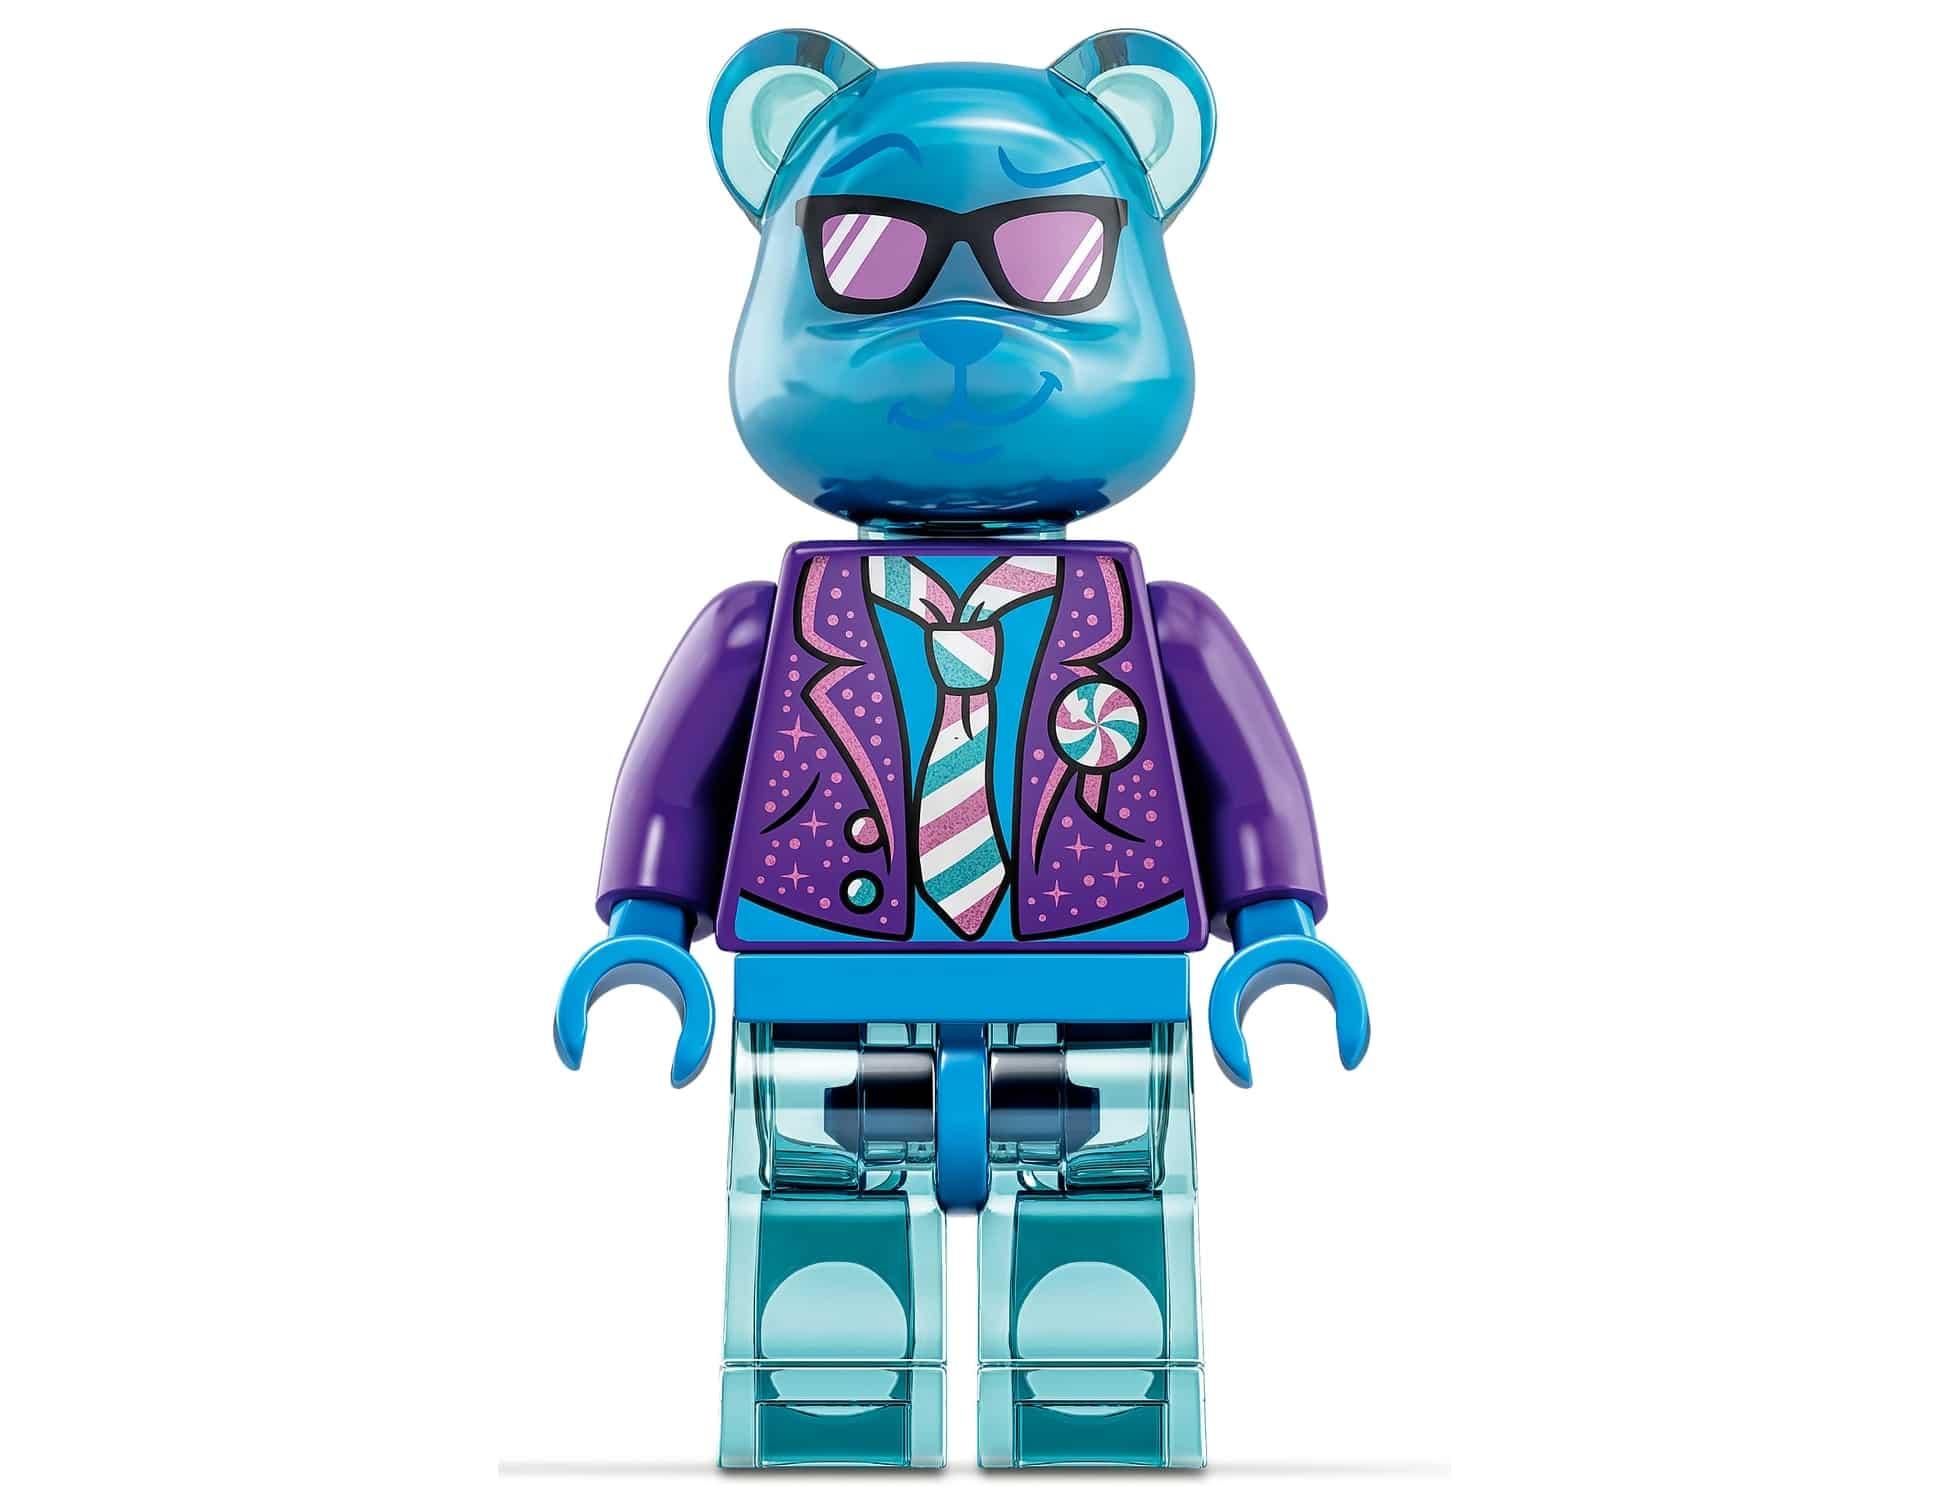 LEGO Vidiyo Transparente Minifigur